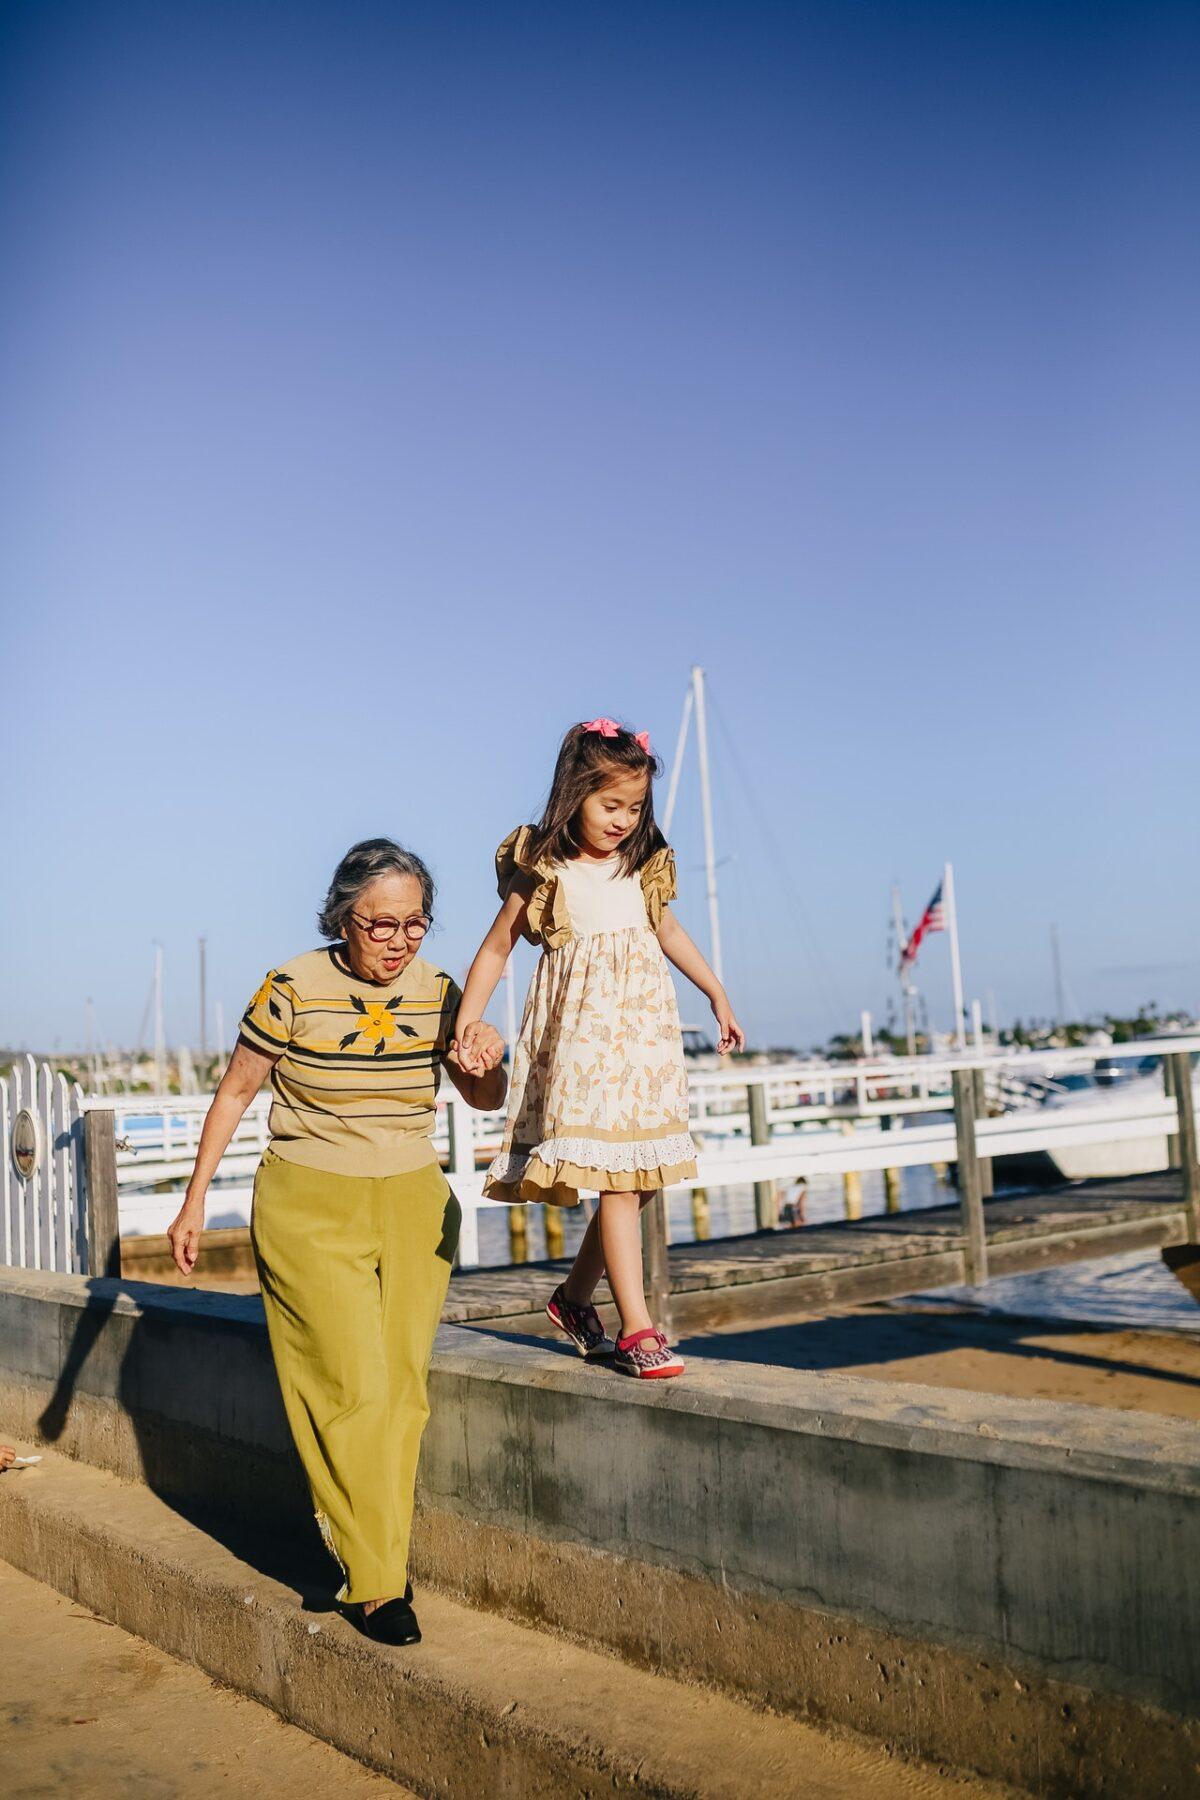 grandma and granddaughter by pier